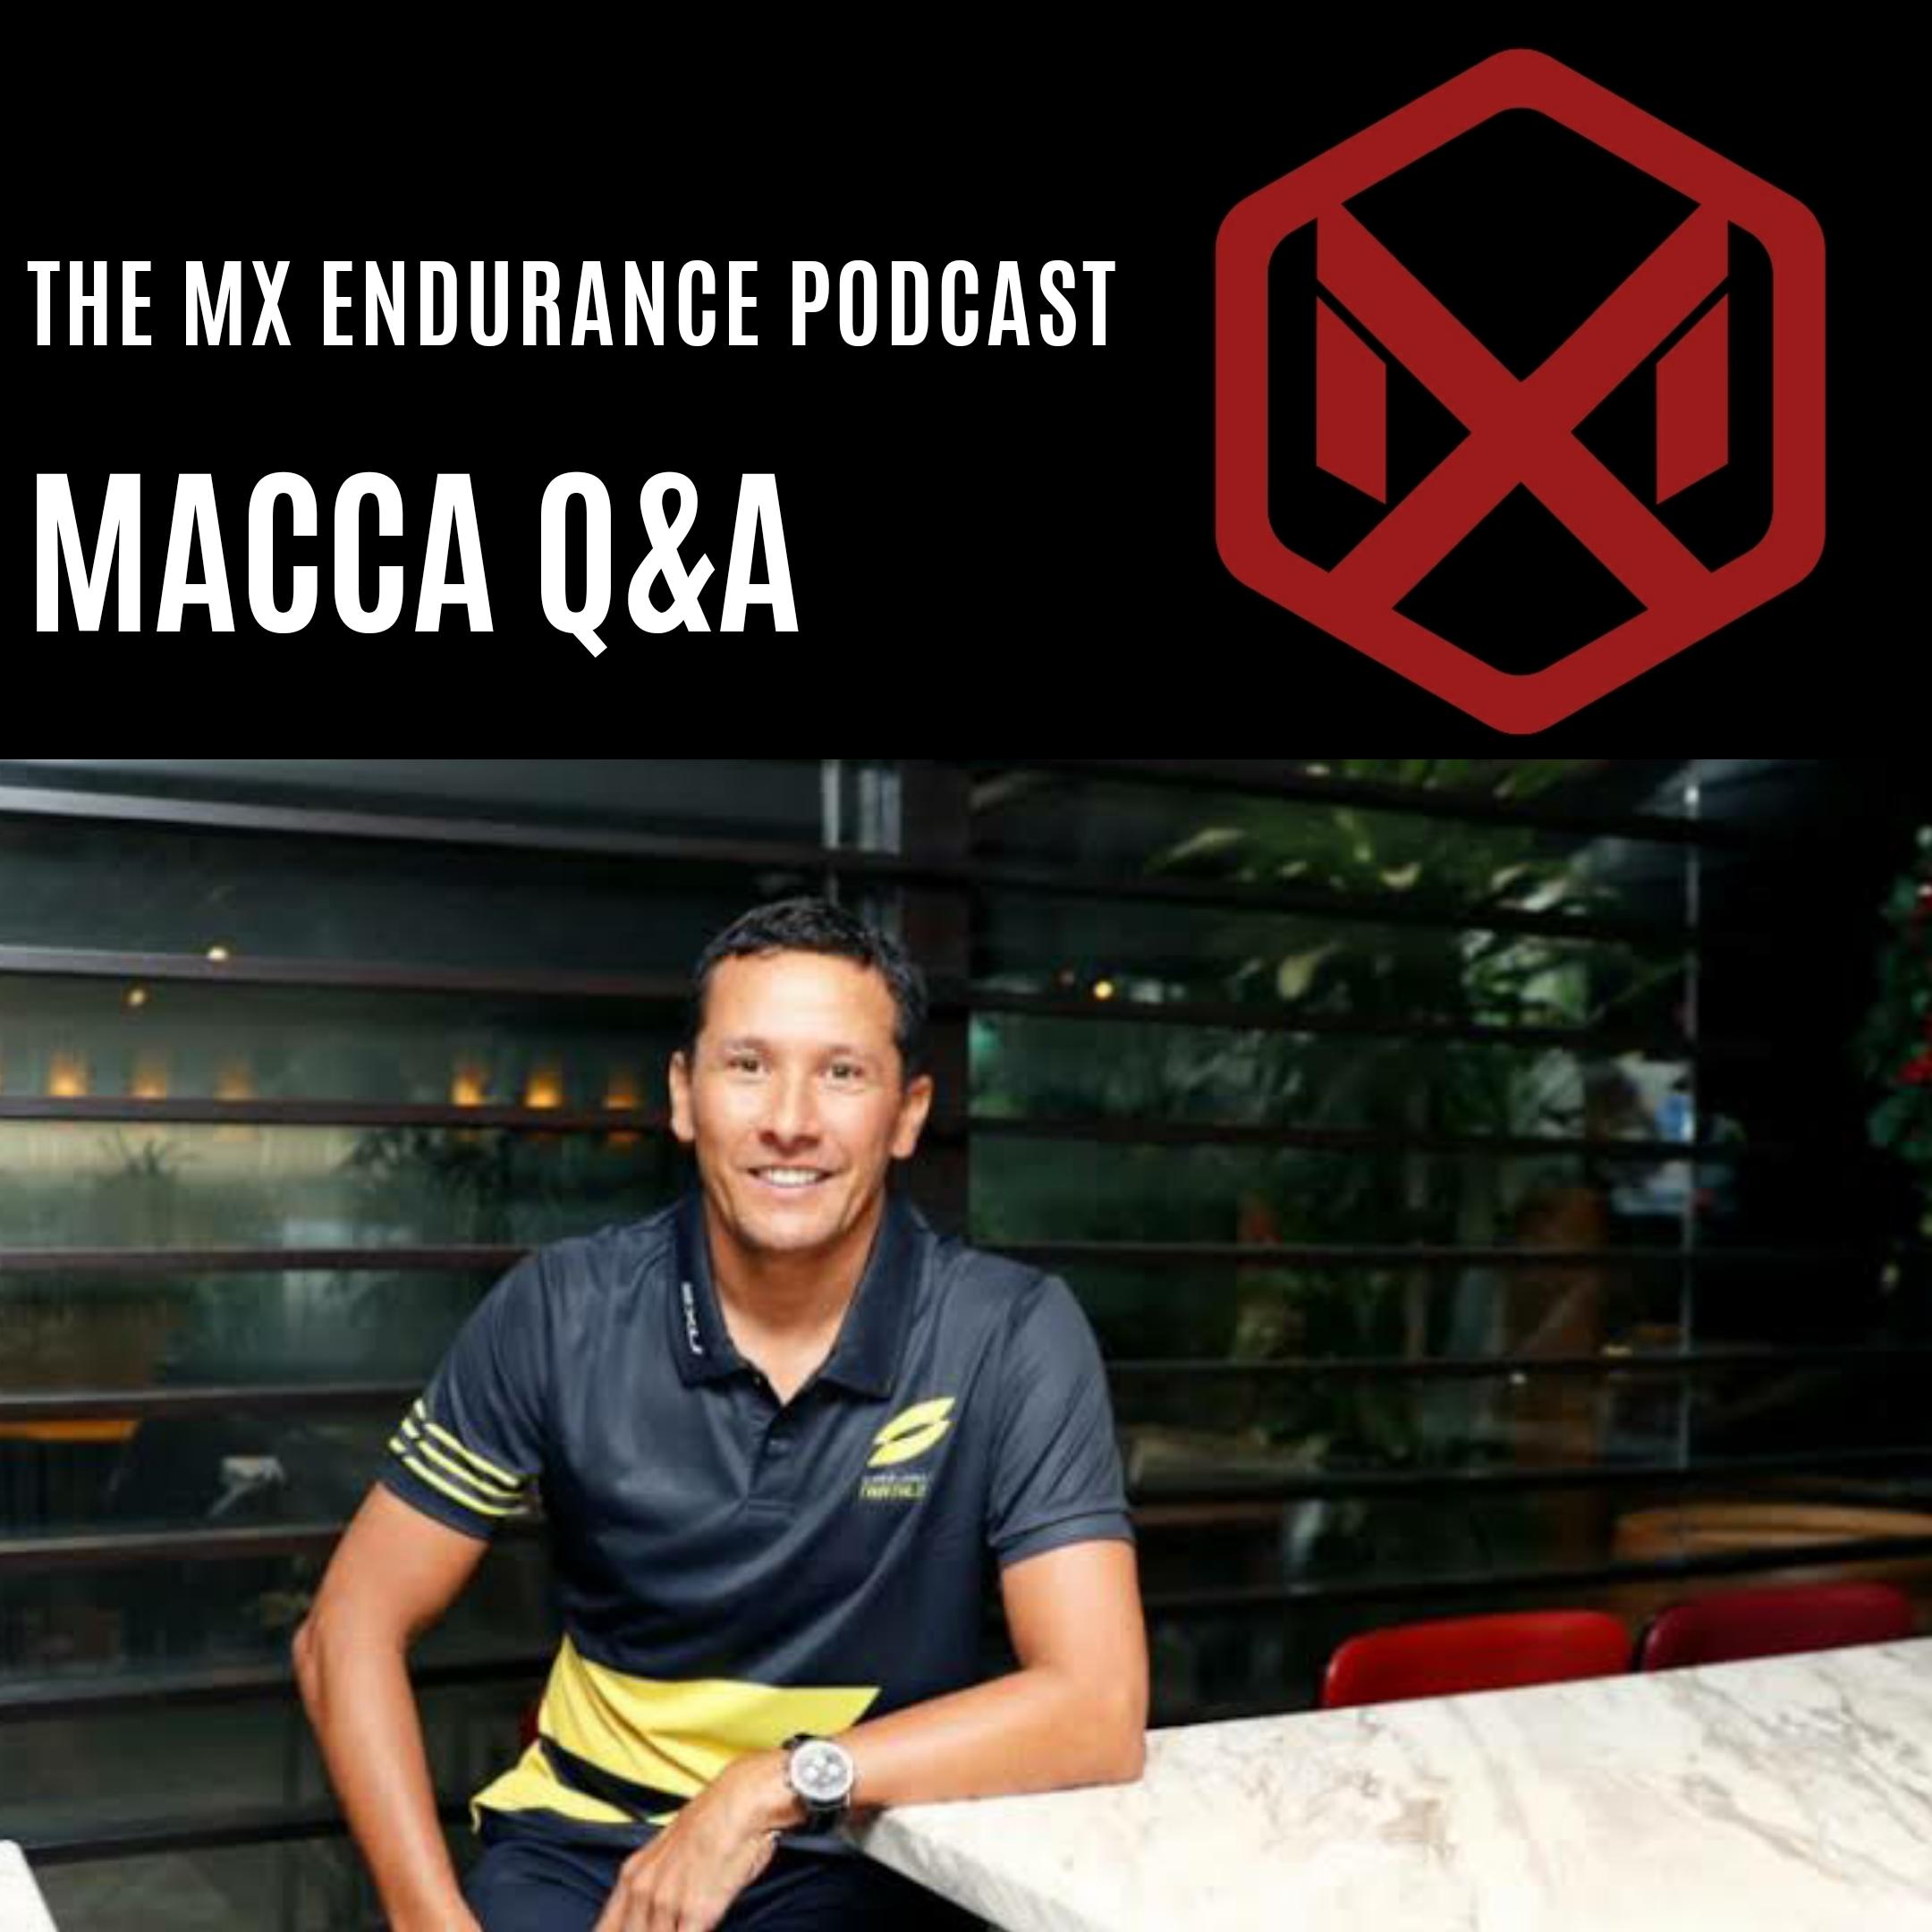 *BONUS* MX Endurance Q&A with Chris